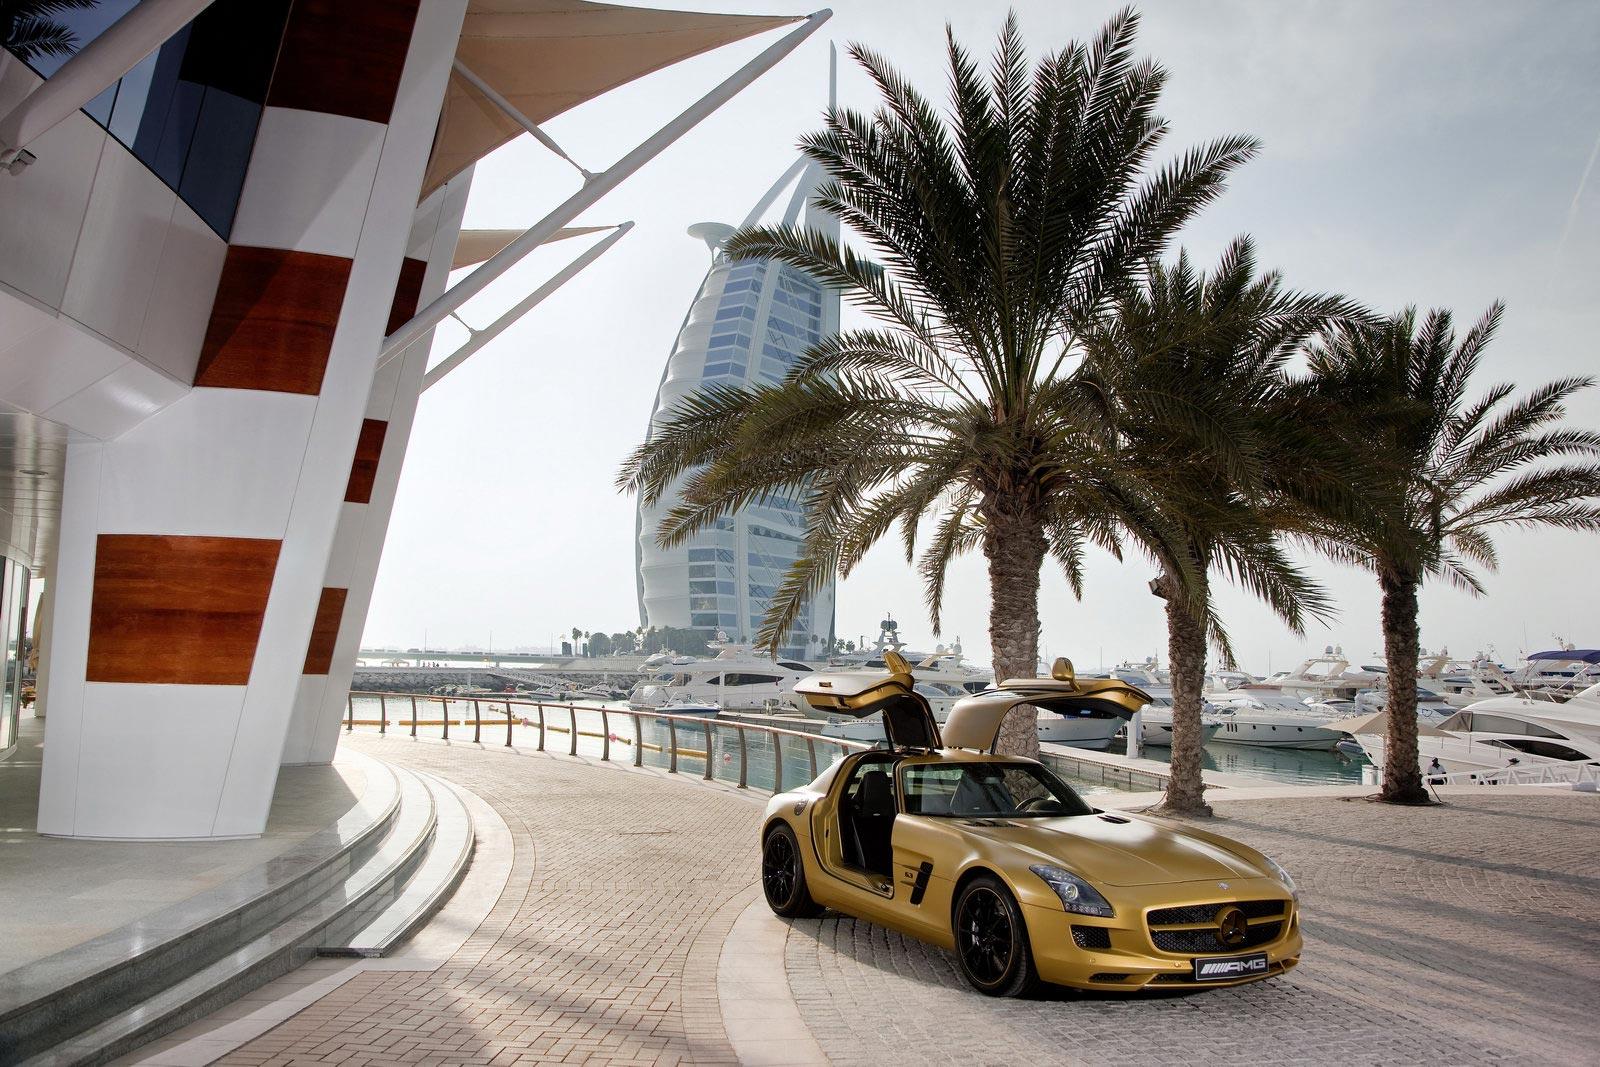 Mercedes SLS AMG Desert Gold 6